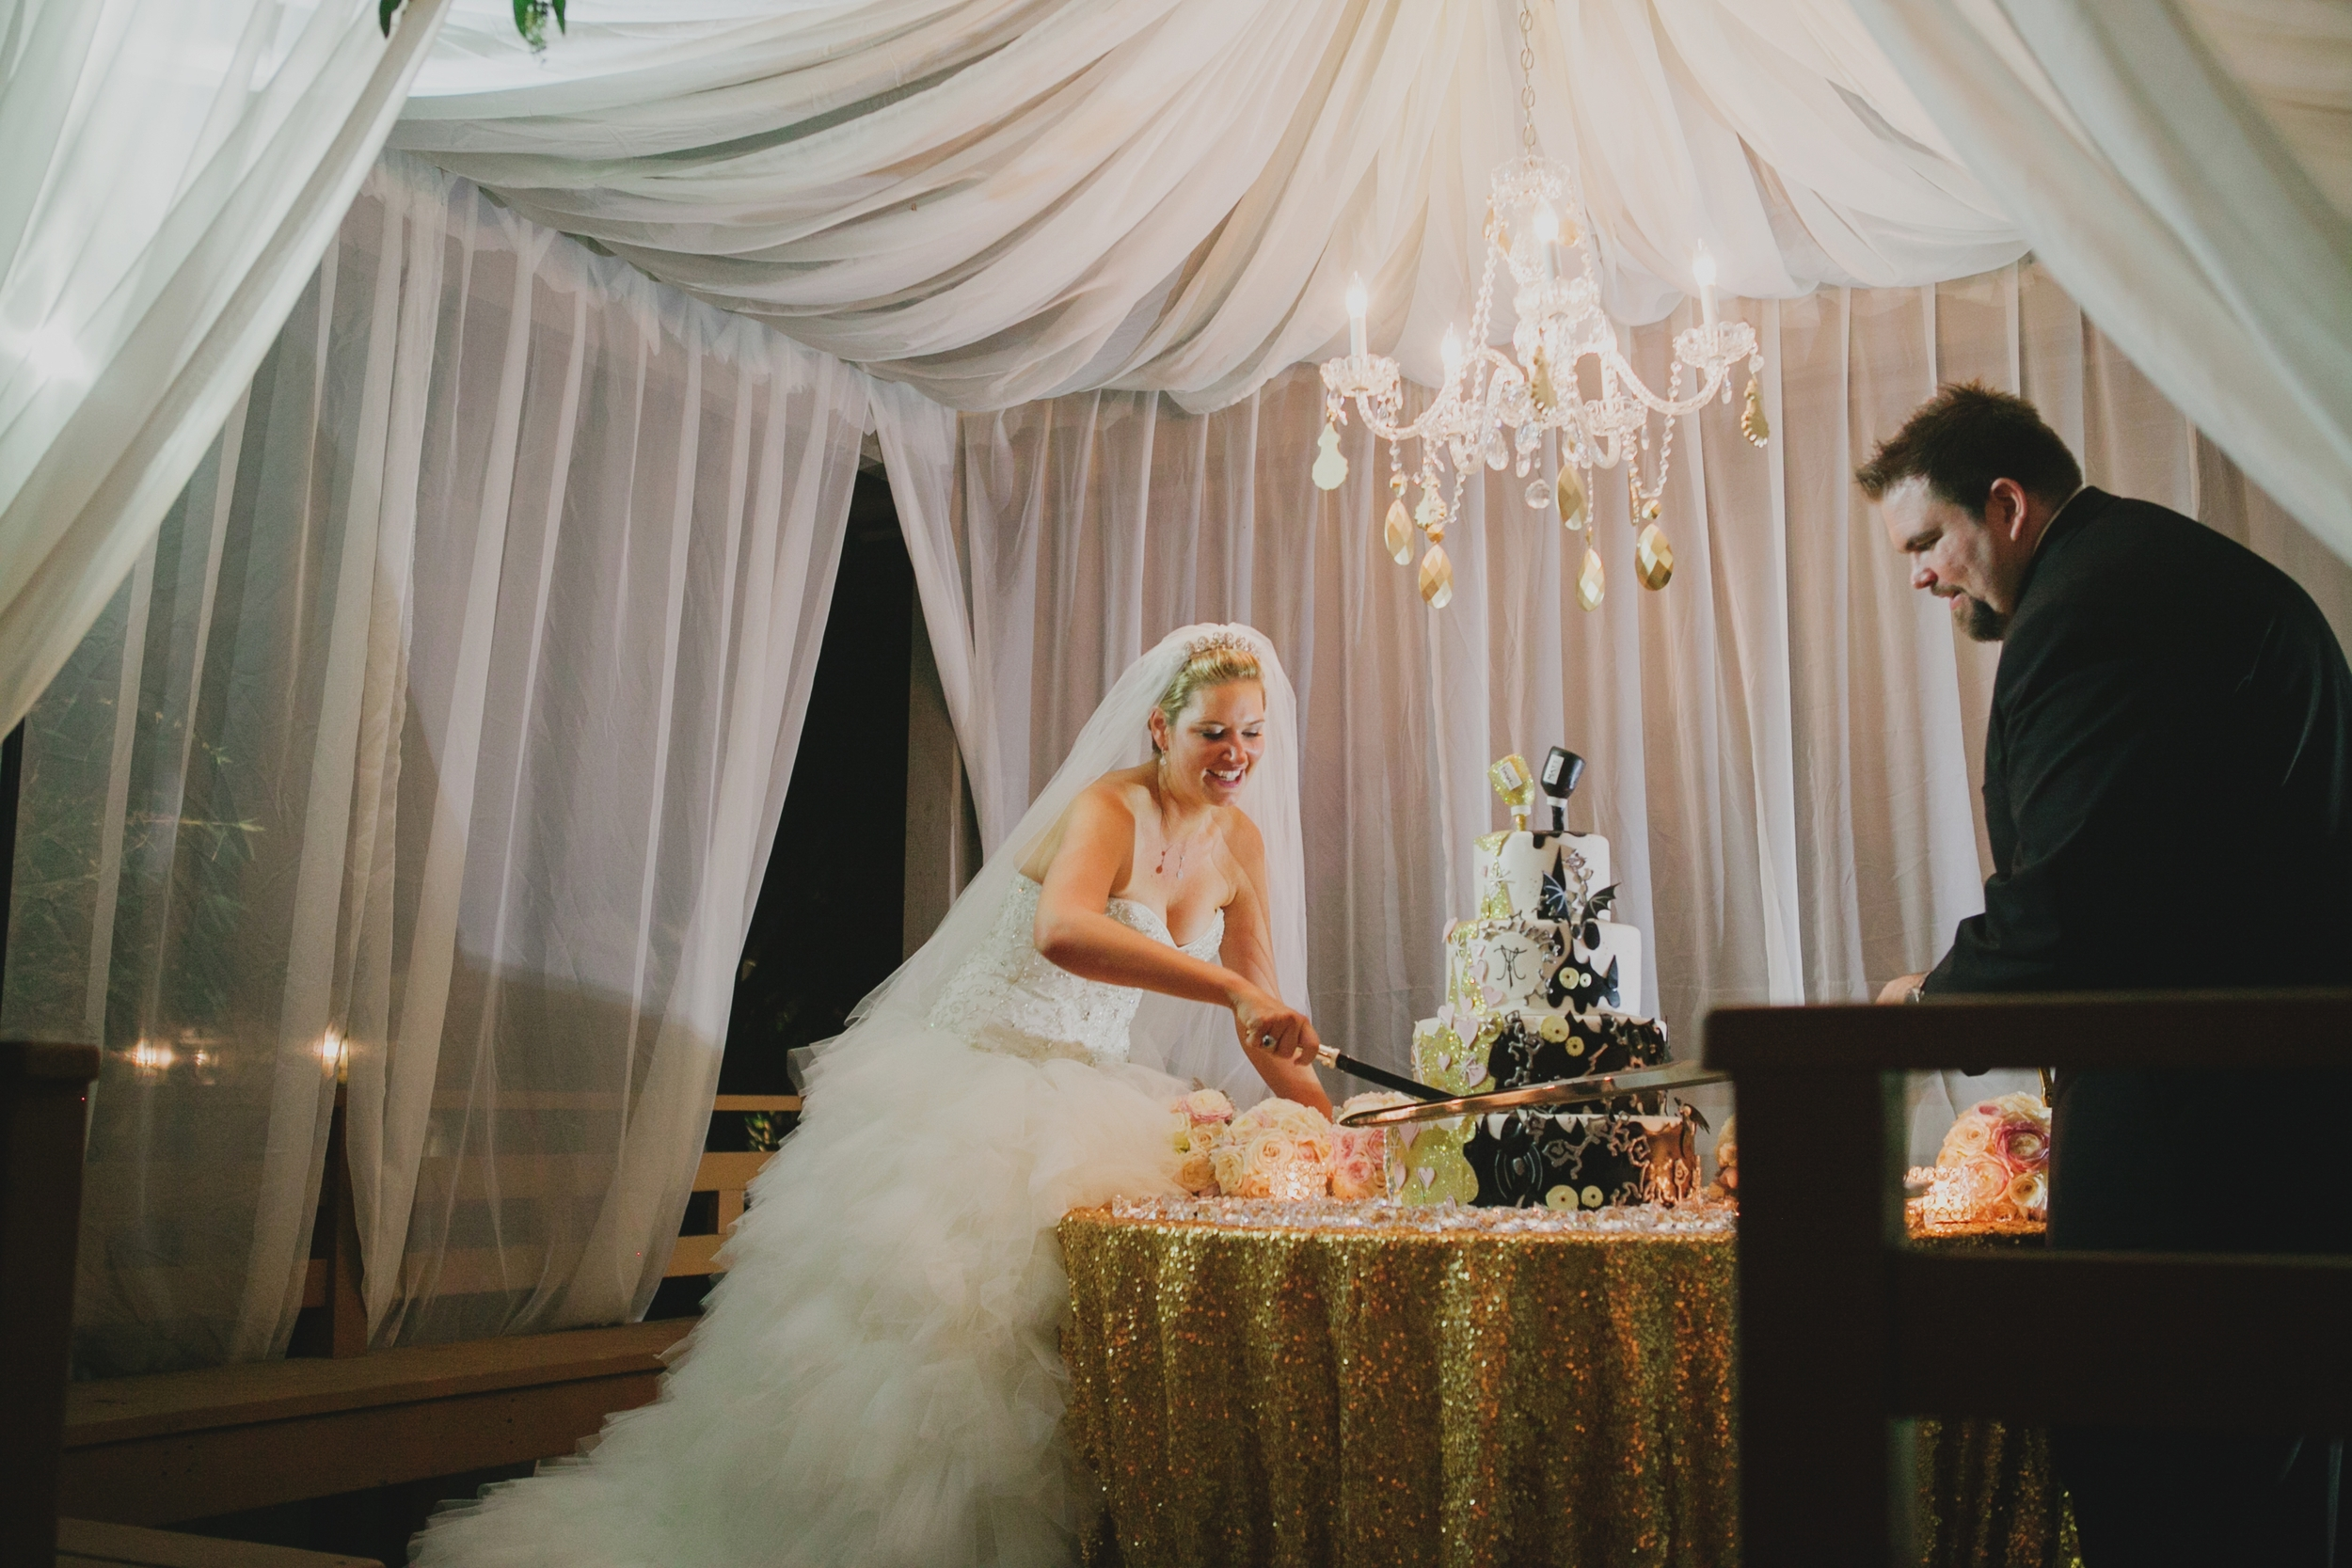 The-Suitcase-Studio-Timree-Matt-Lifestyle-Wedding-Photographer-113.jpg